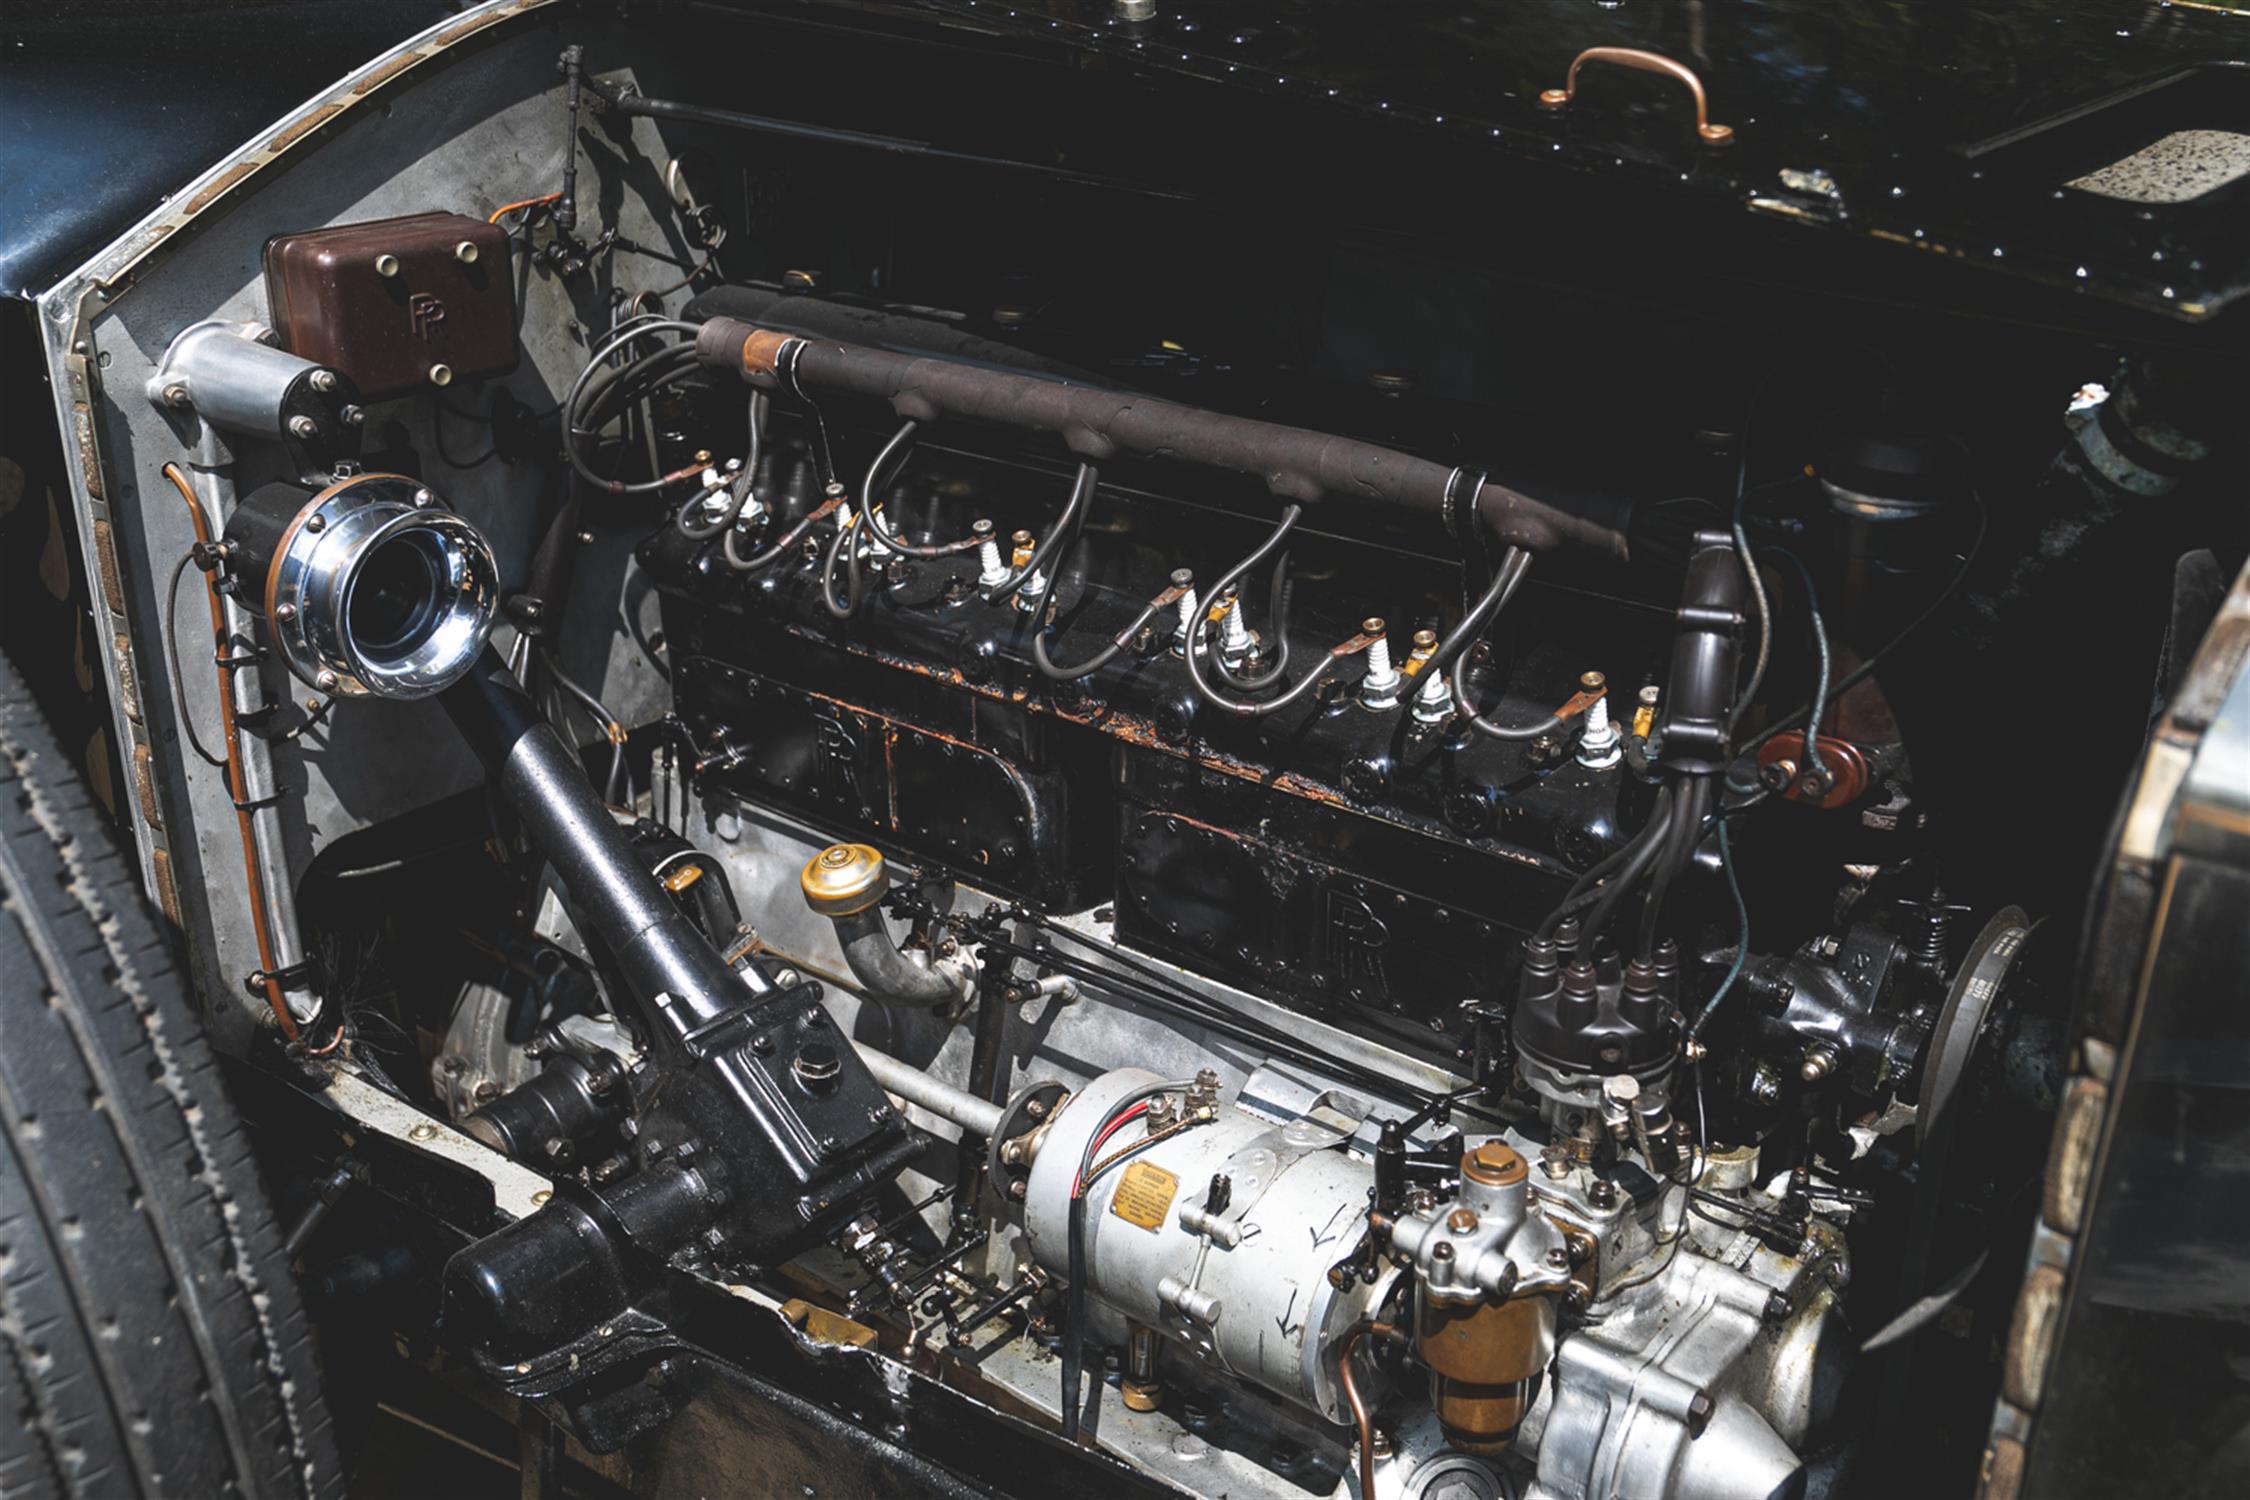 1927 Rolls-Royce Phantom 1 Open Tourer - Image 4 of 10